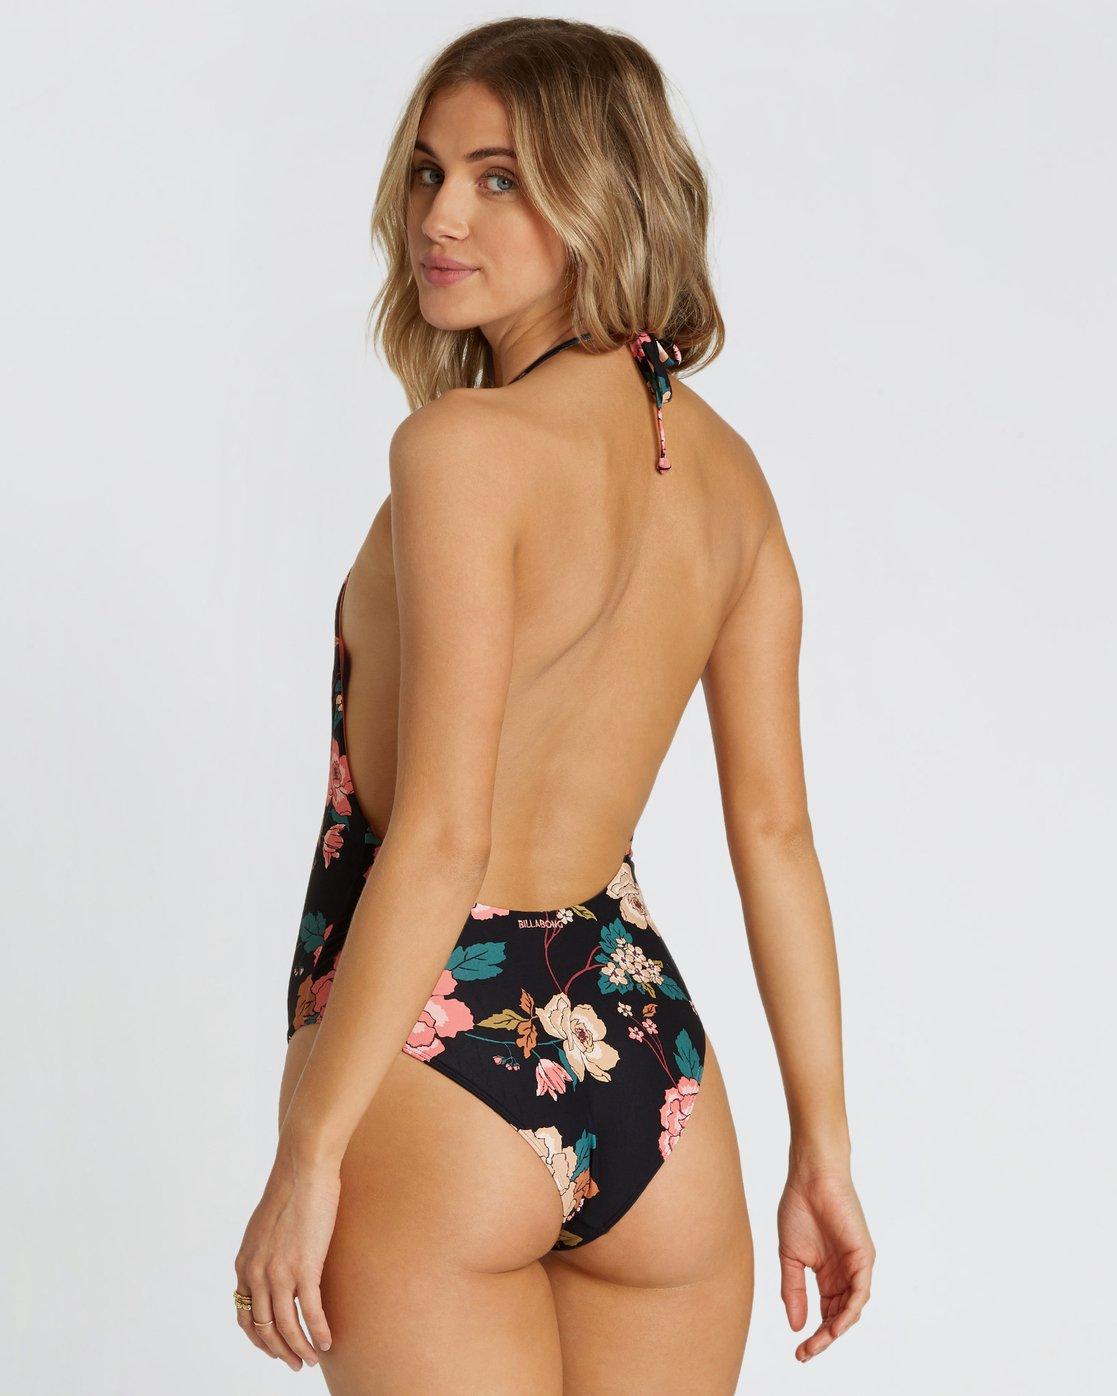 Billabong Womens Linger on One Piece Swimsuit